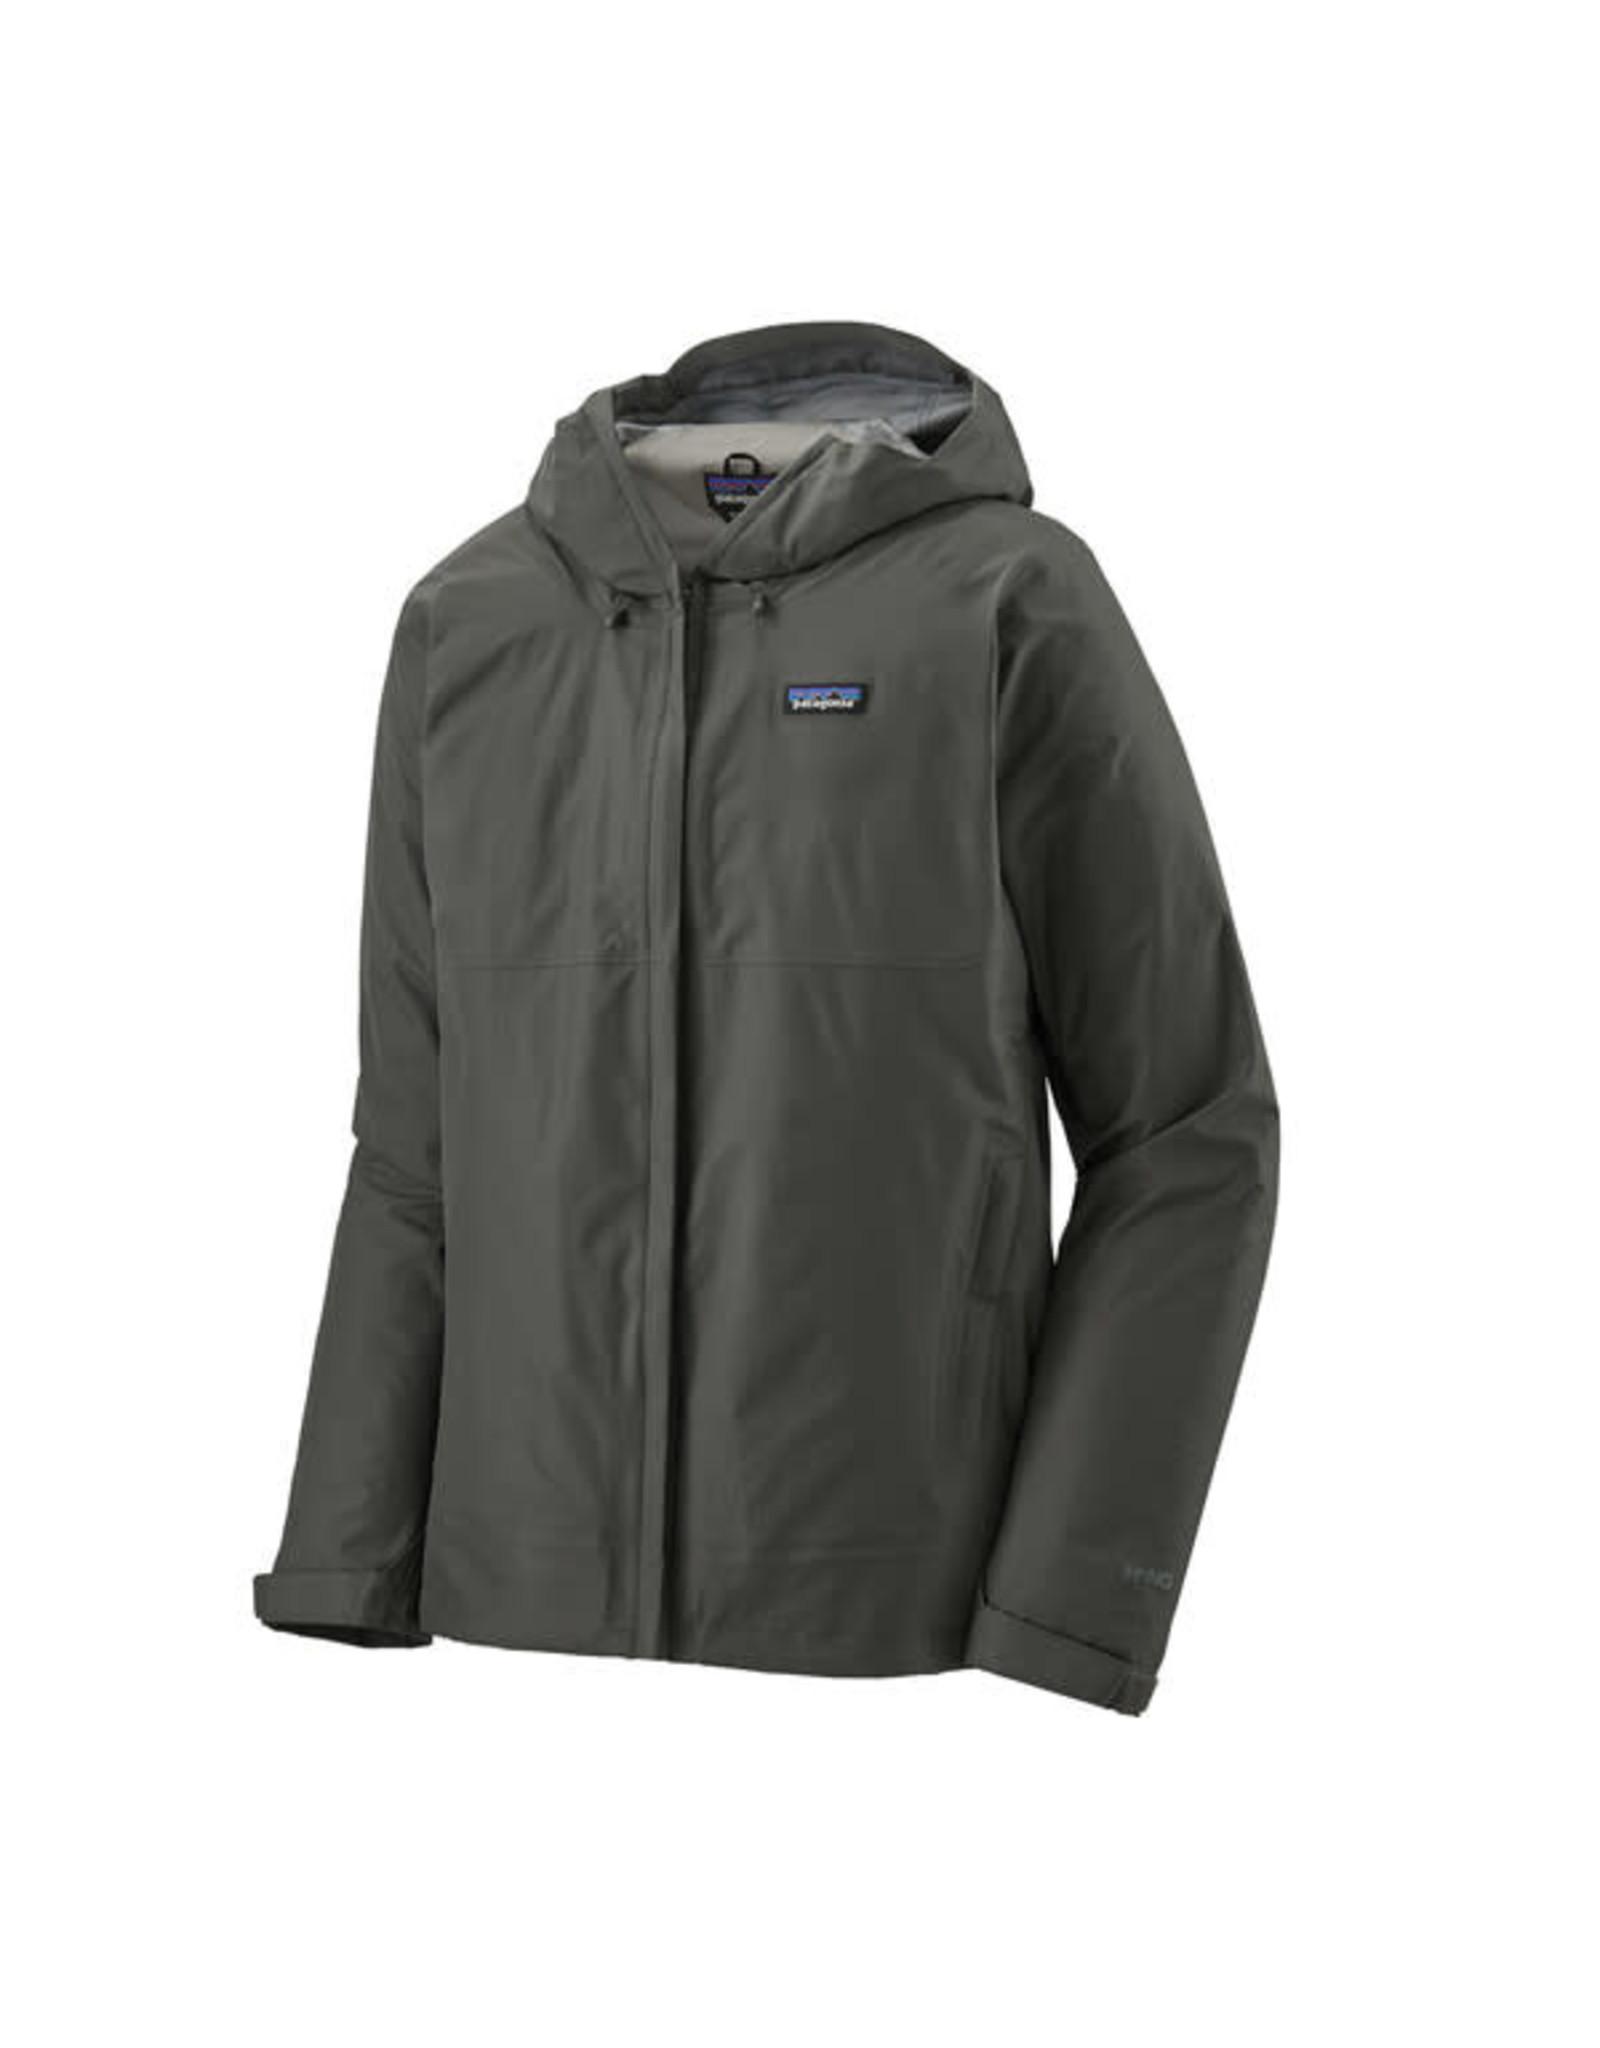 Patagonia Men's Torrentshell 3L Jacket - Forge Grey